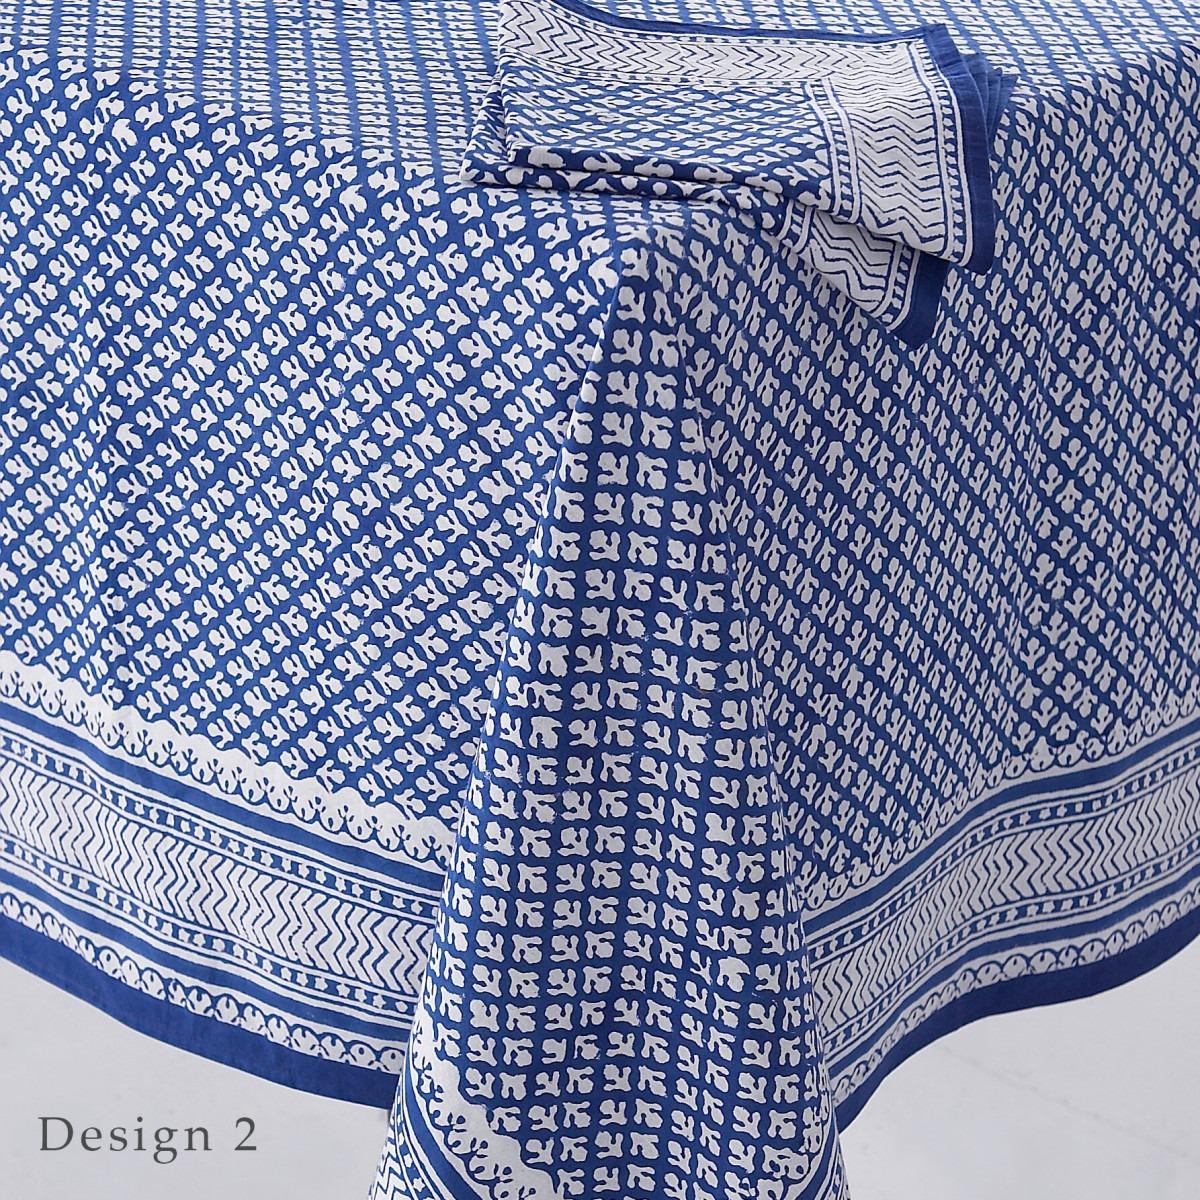 Block Printed Tablecloth Design 2